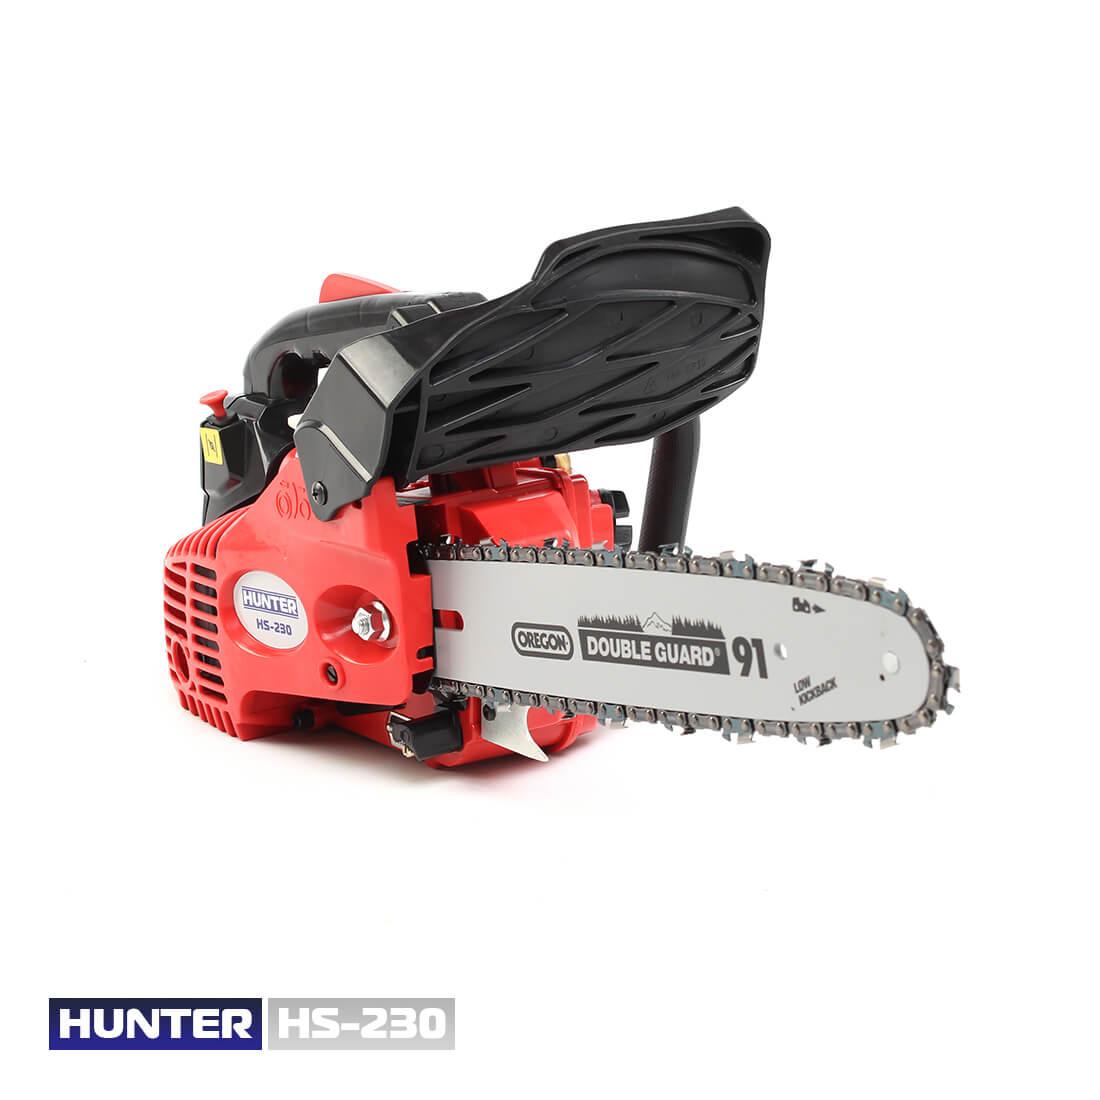 Фото Hunter HS-230 цена 3470грн №1 — Hunter